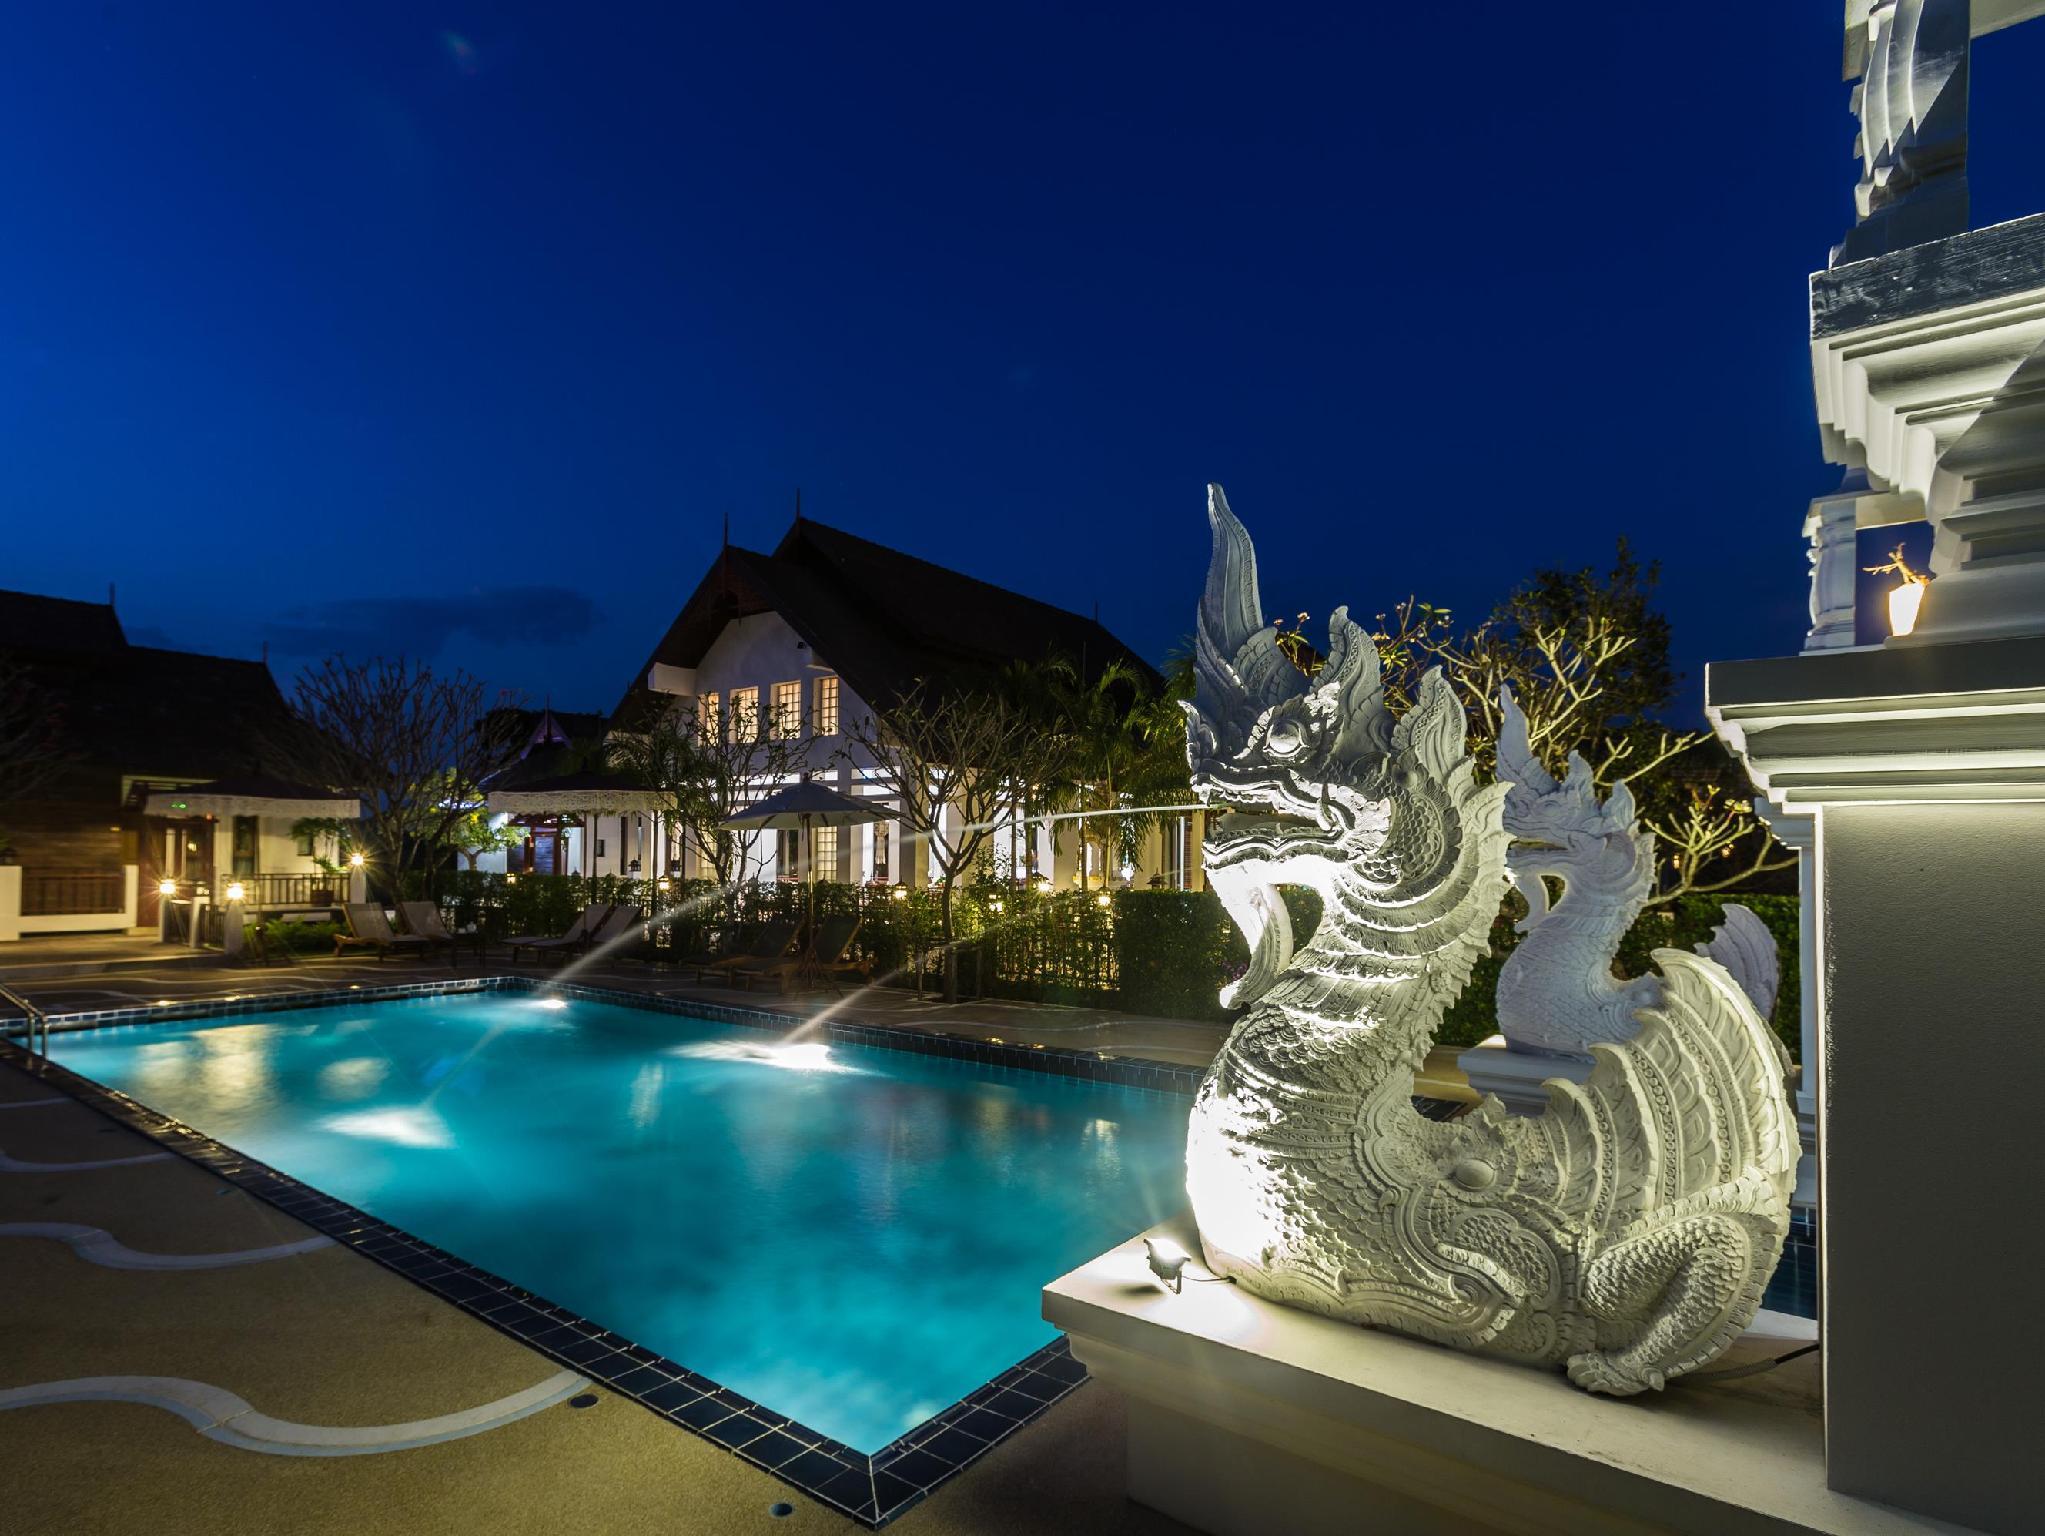 Doltara Boutique Resort,ดลธารา บูทิก รีสอร์ต